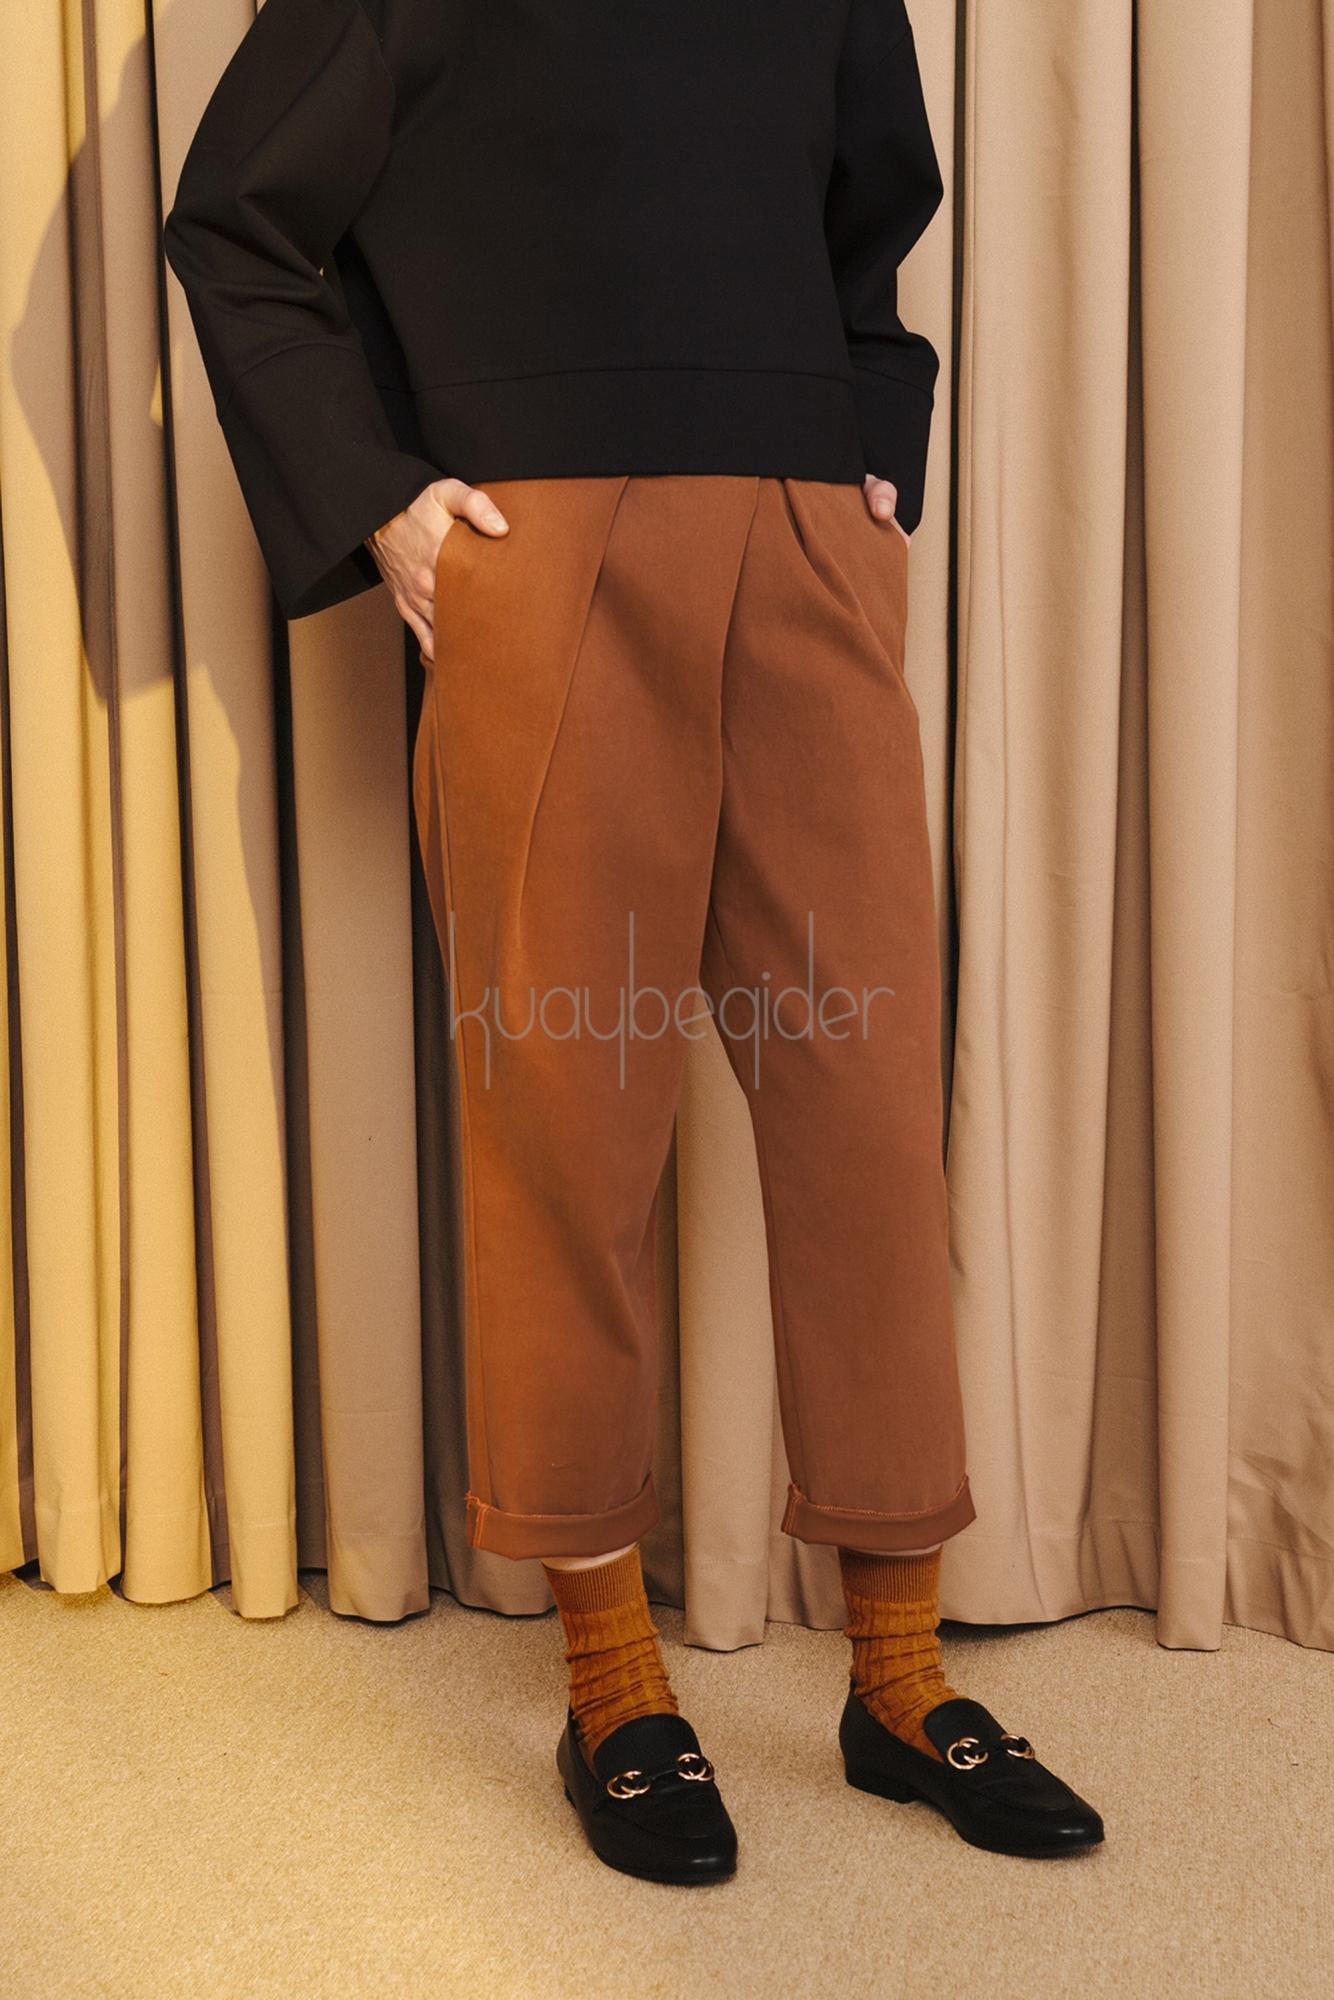 Kuaybe Gider - 4039 Tarçın Pantolon